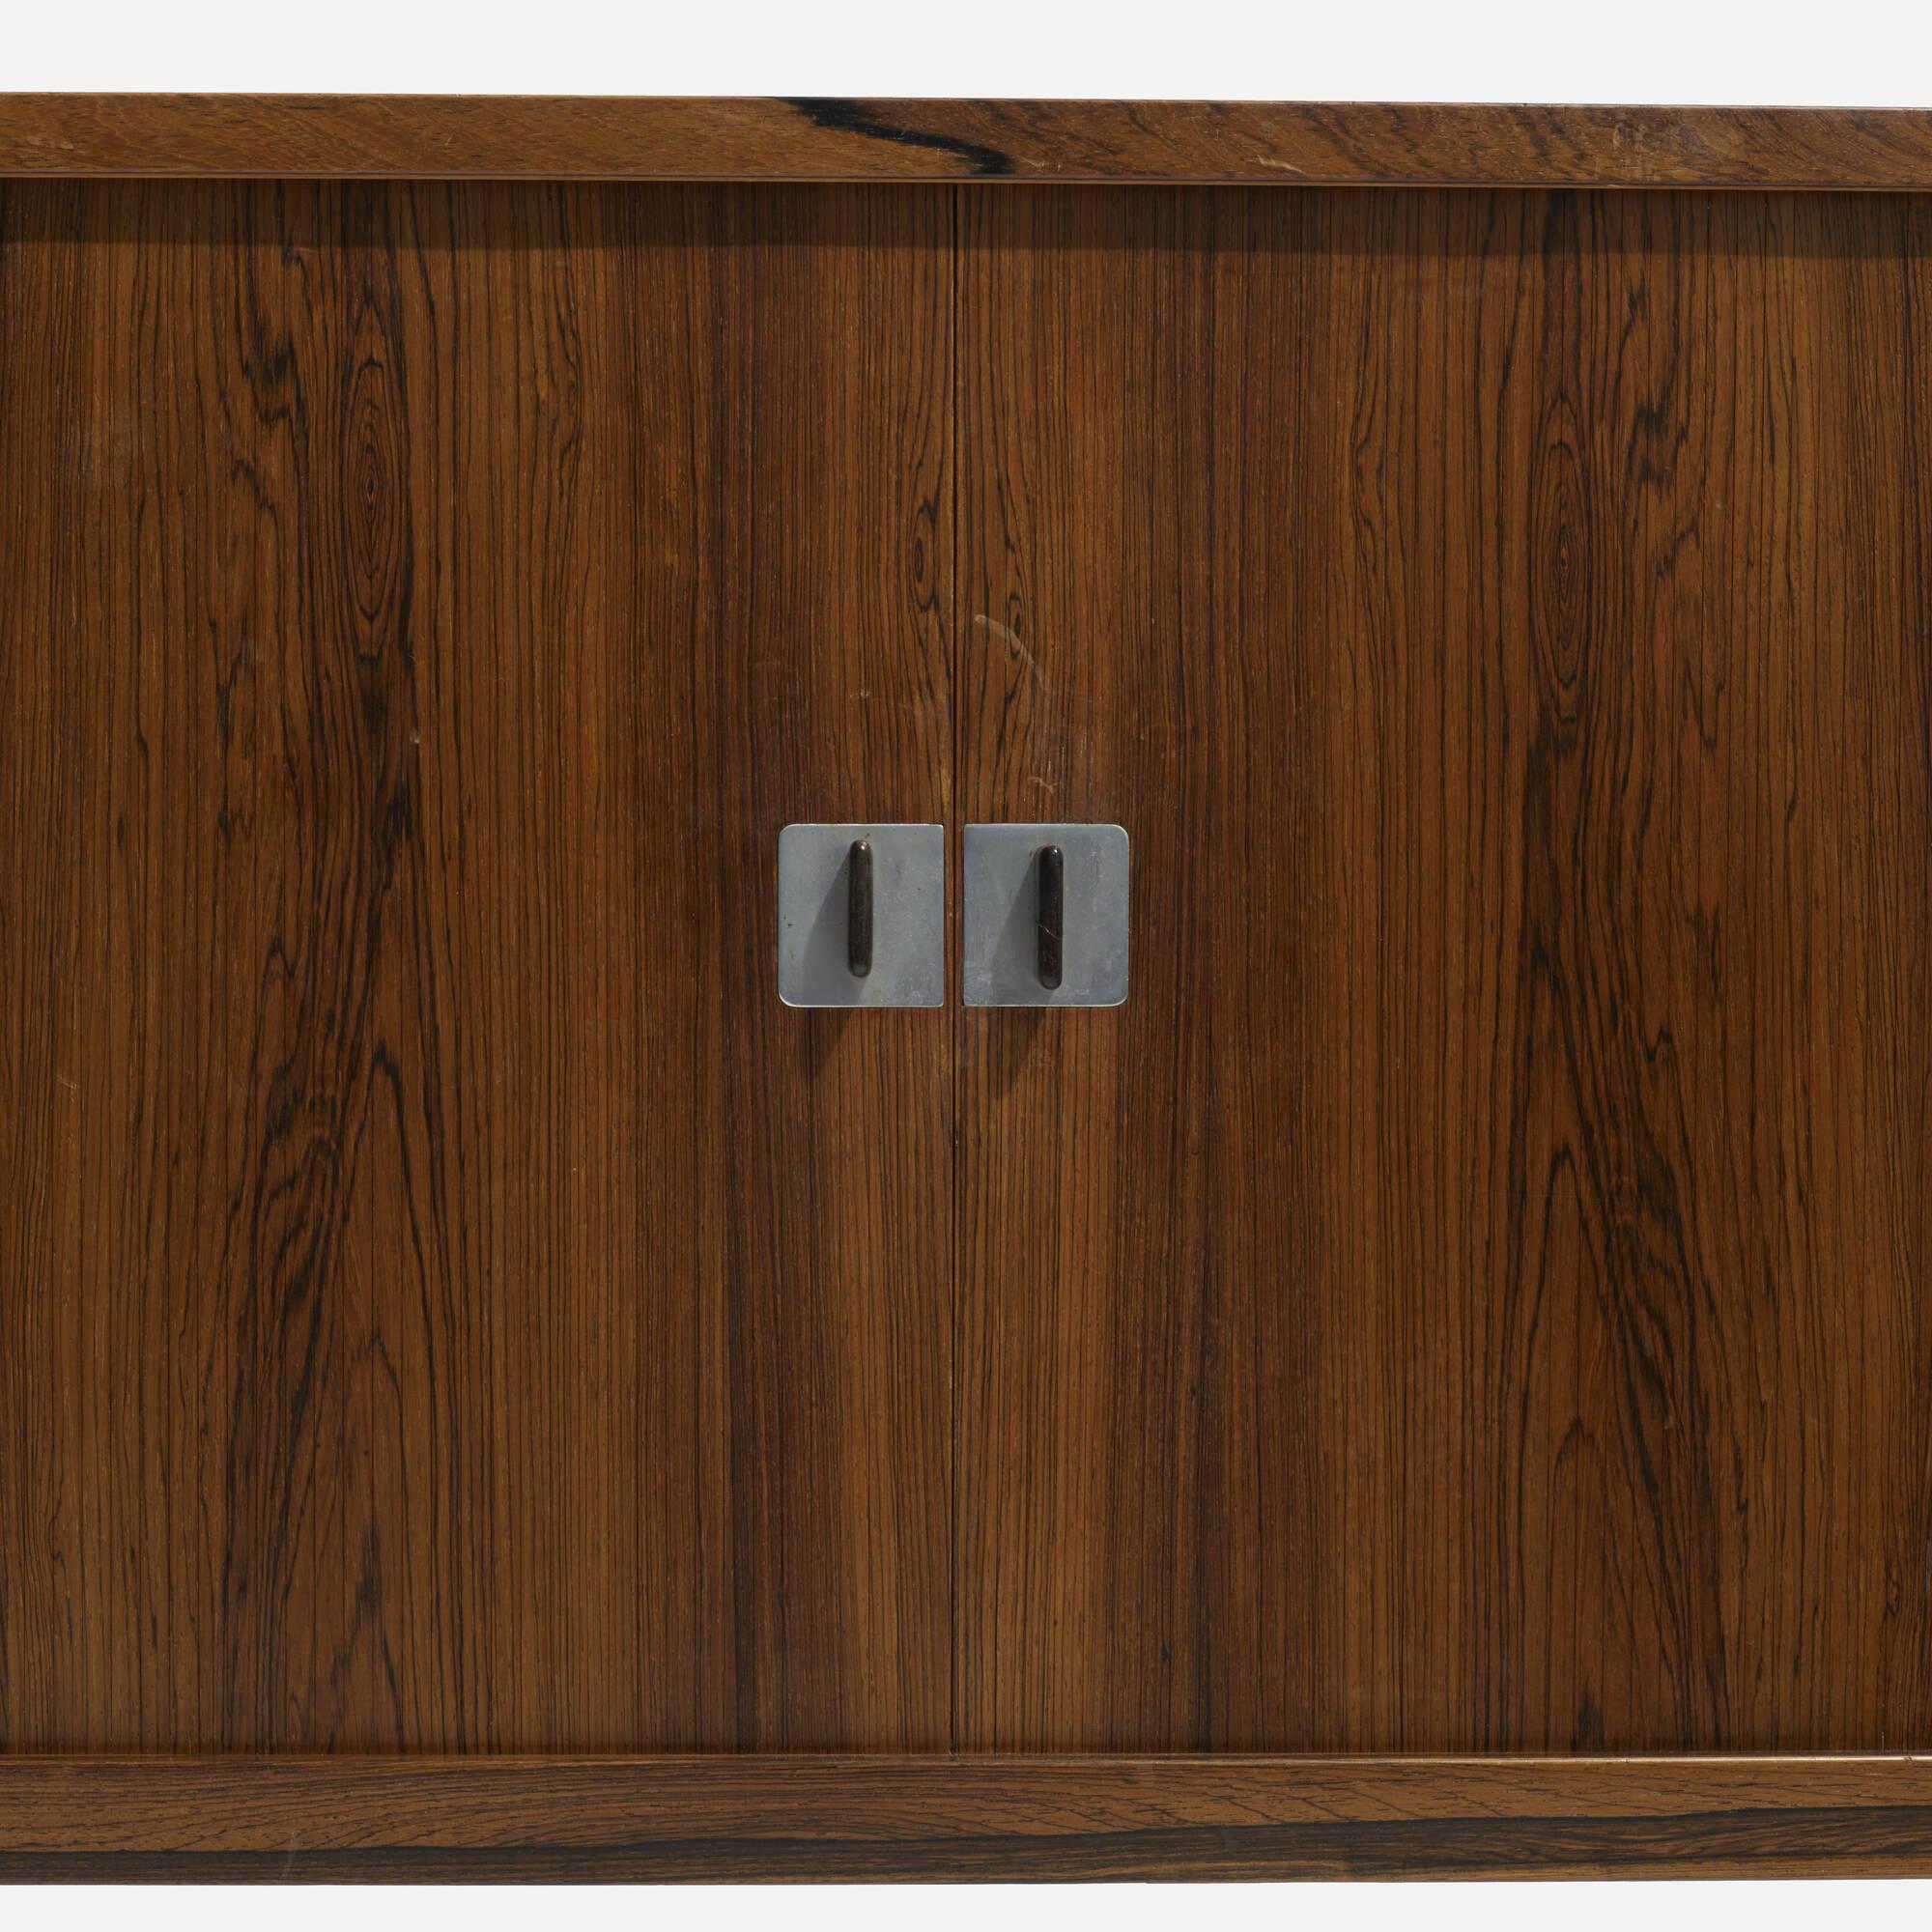 277: Hans J. Wegner / cabinet, model RY25 (4 of 4)